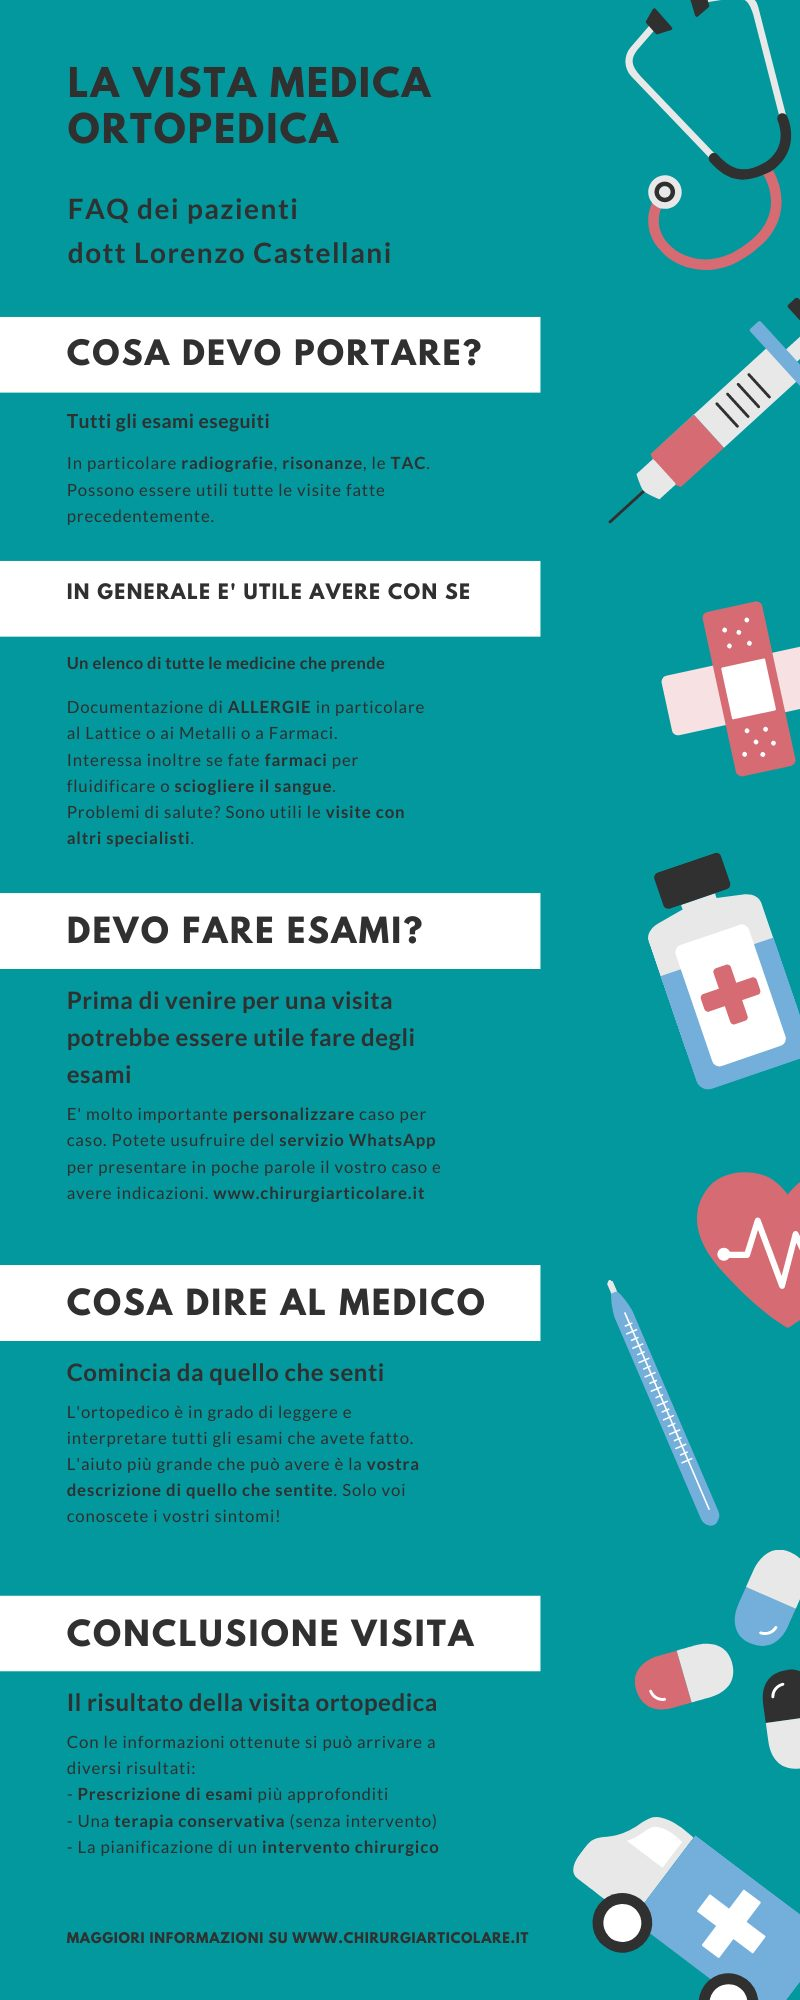 infografica-visita-medica